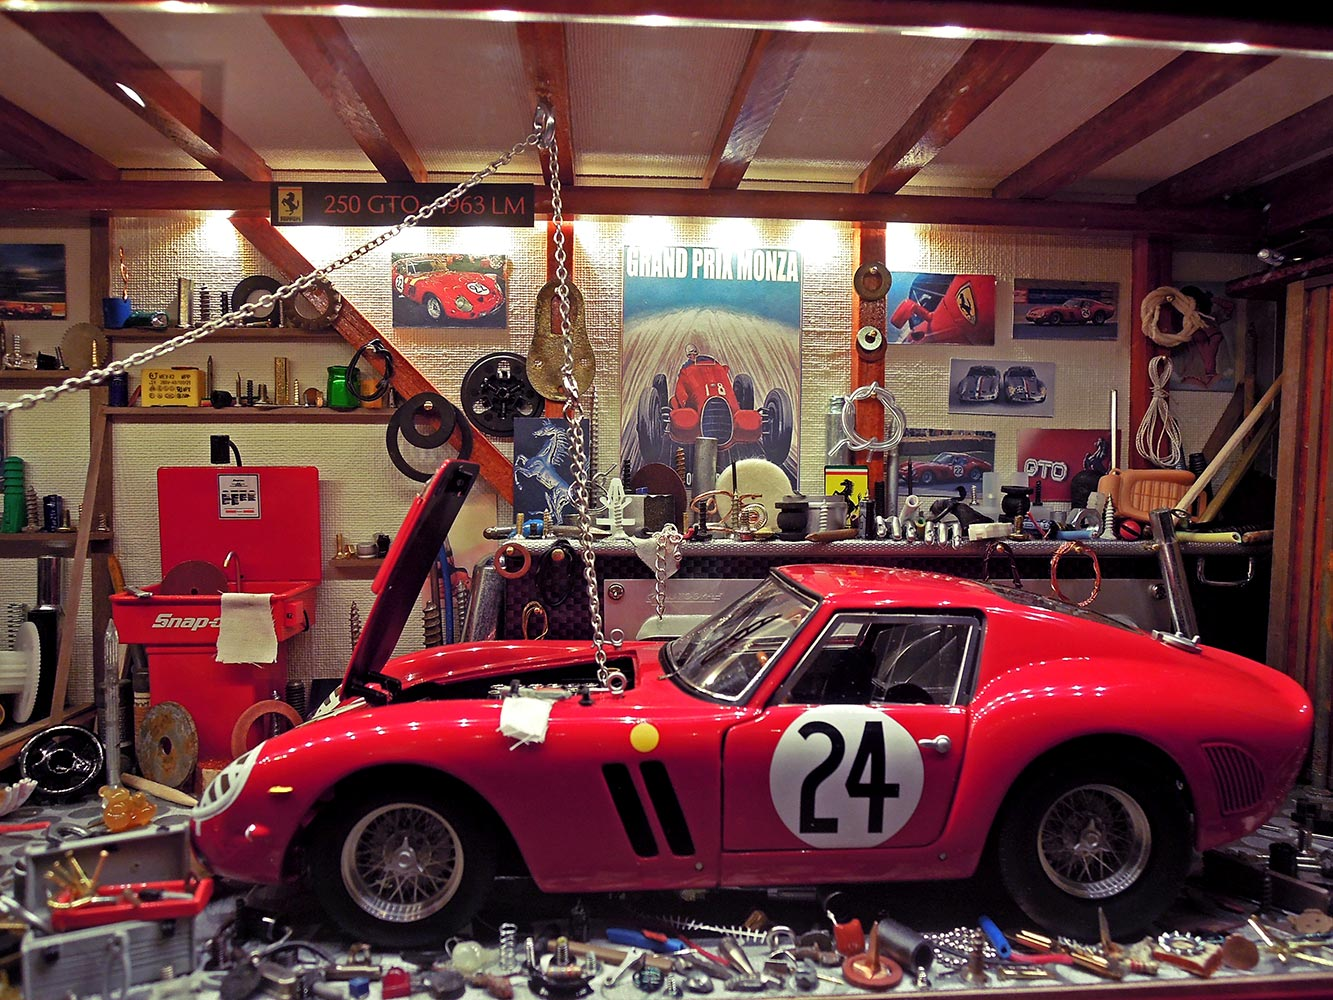 Ferrari-230-GTO-1963-LM-5